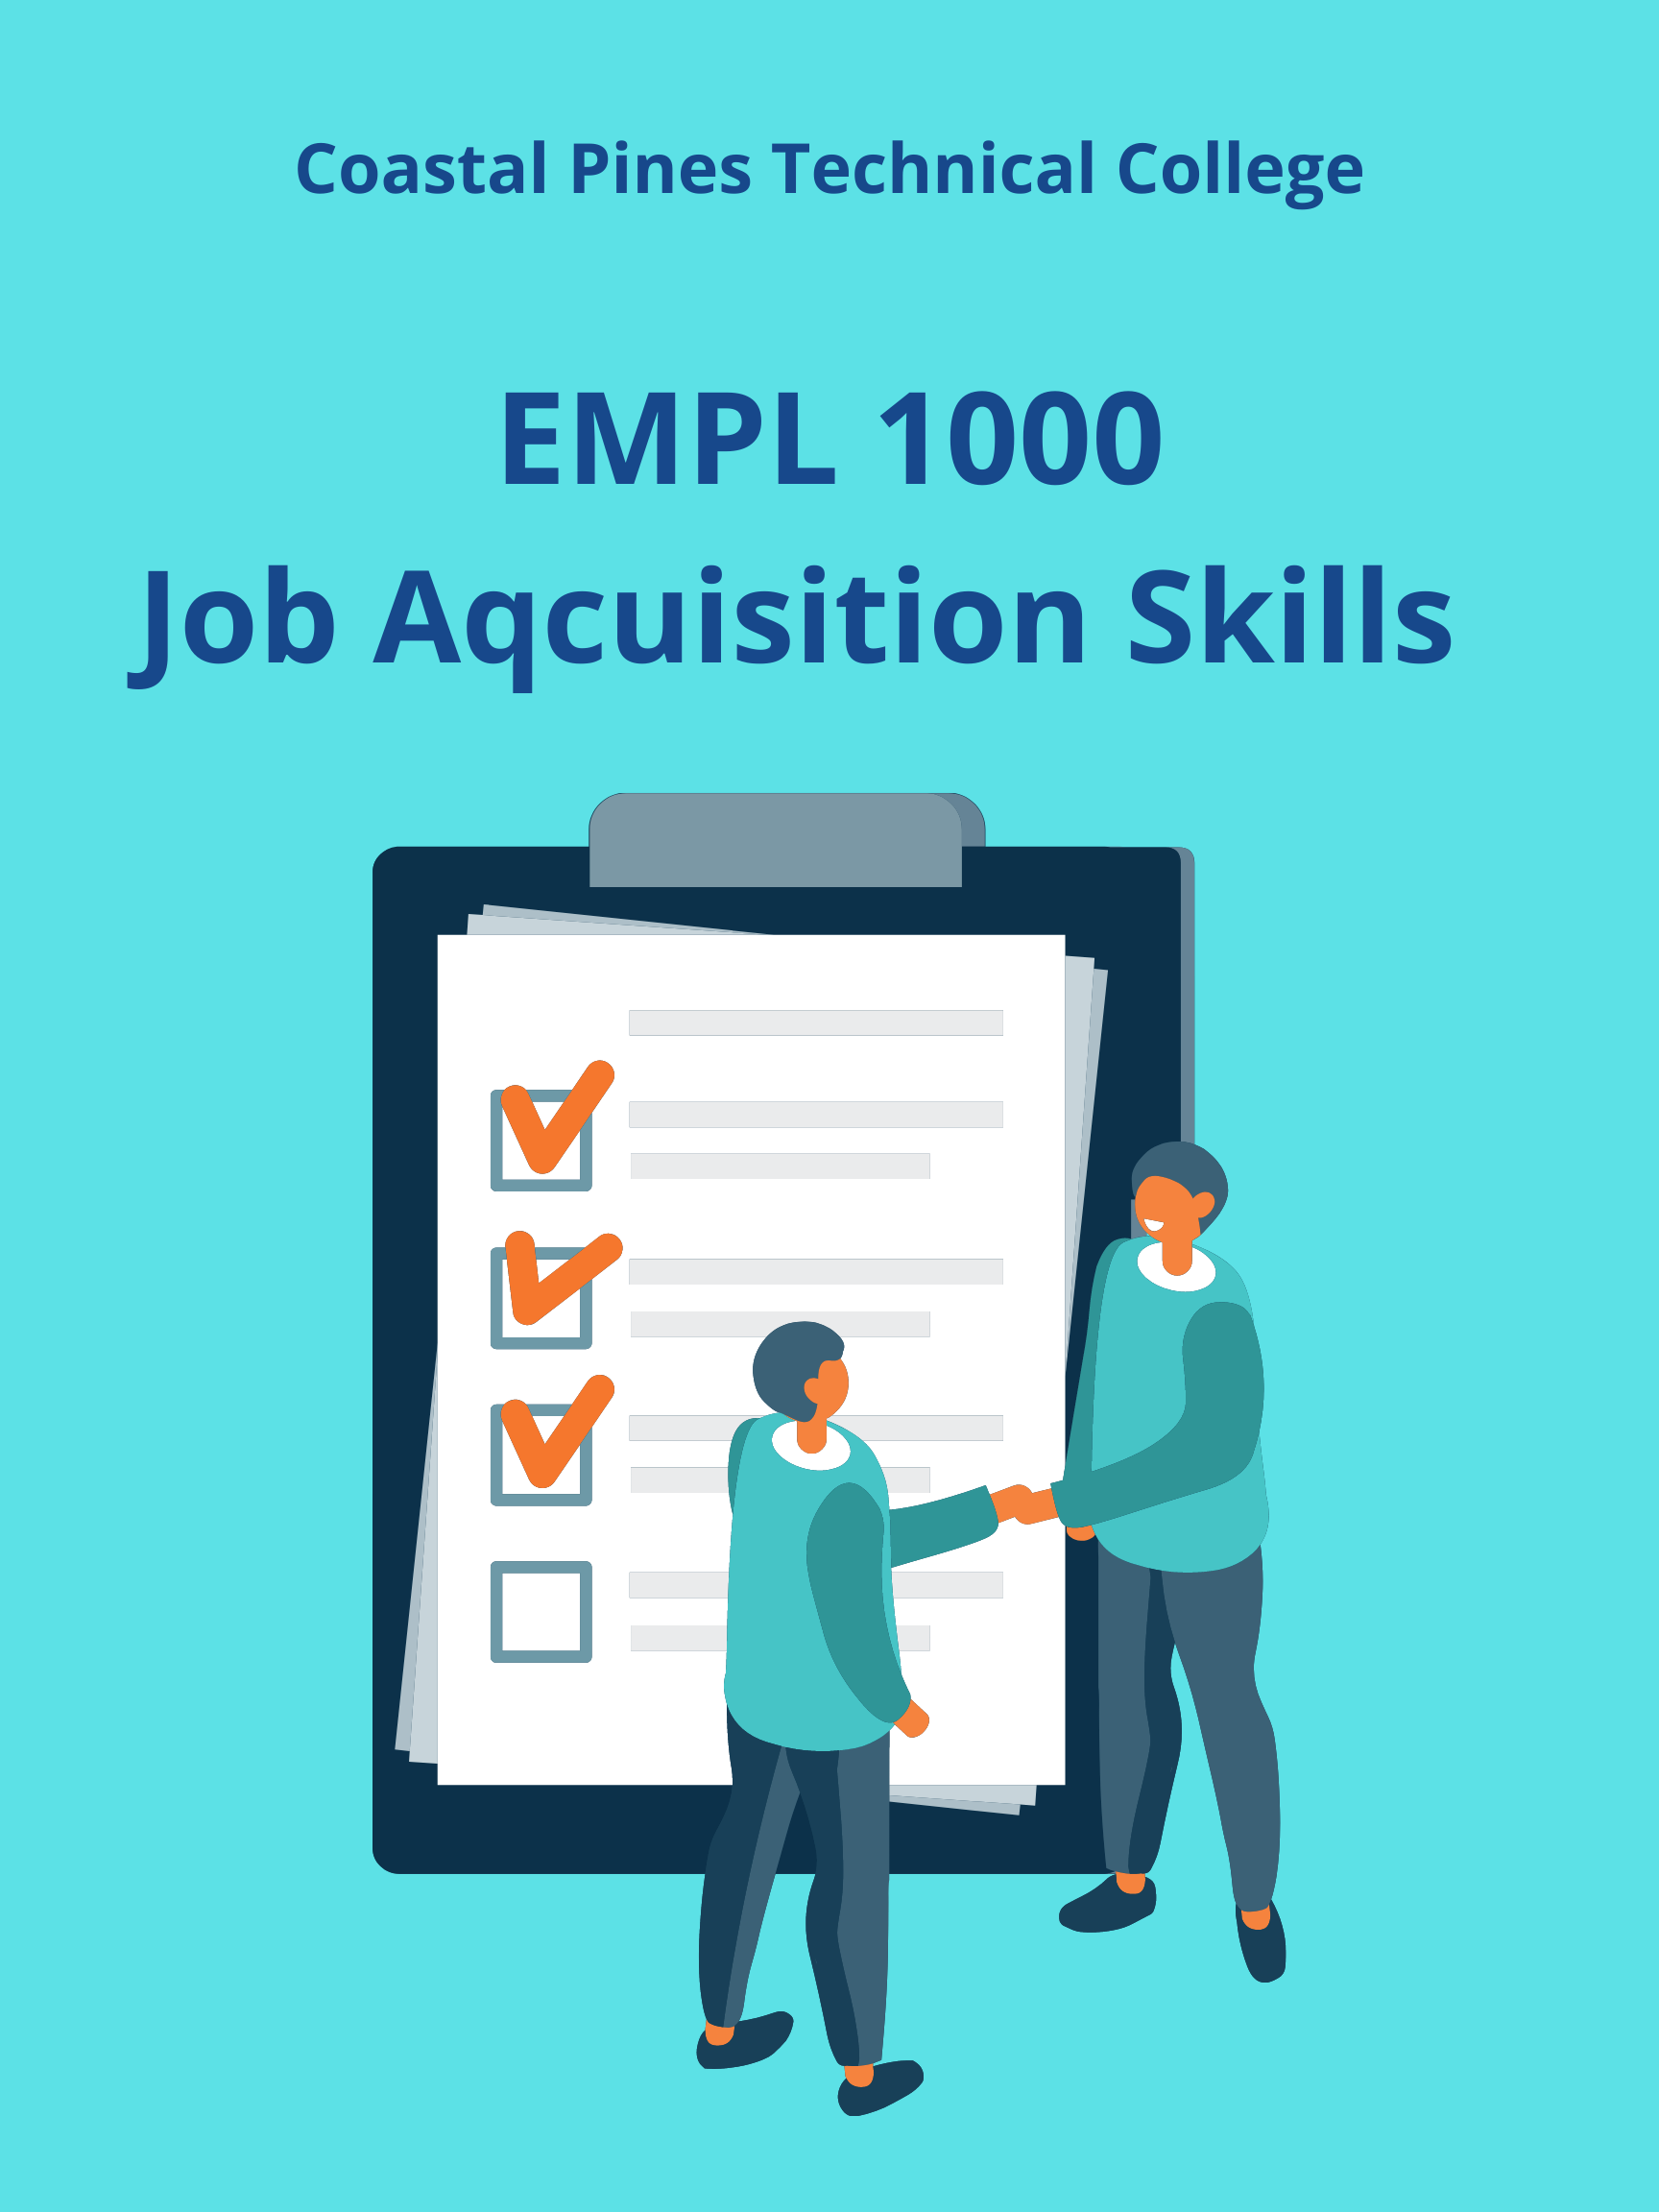 Coastal Pines Technical College EMPL 1000 Job Acquisition Skills